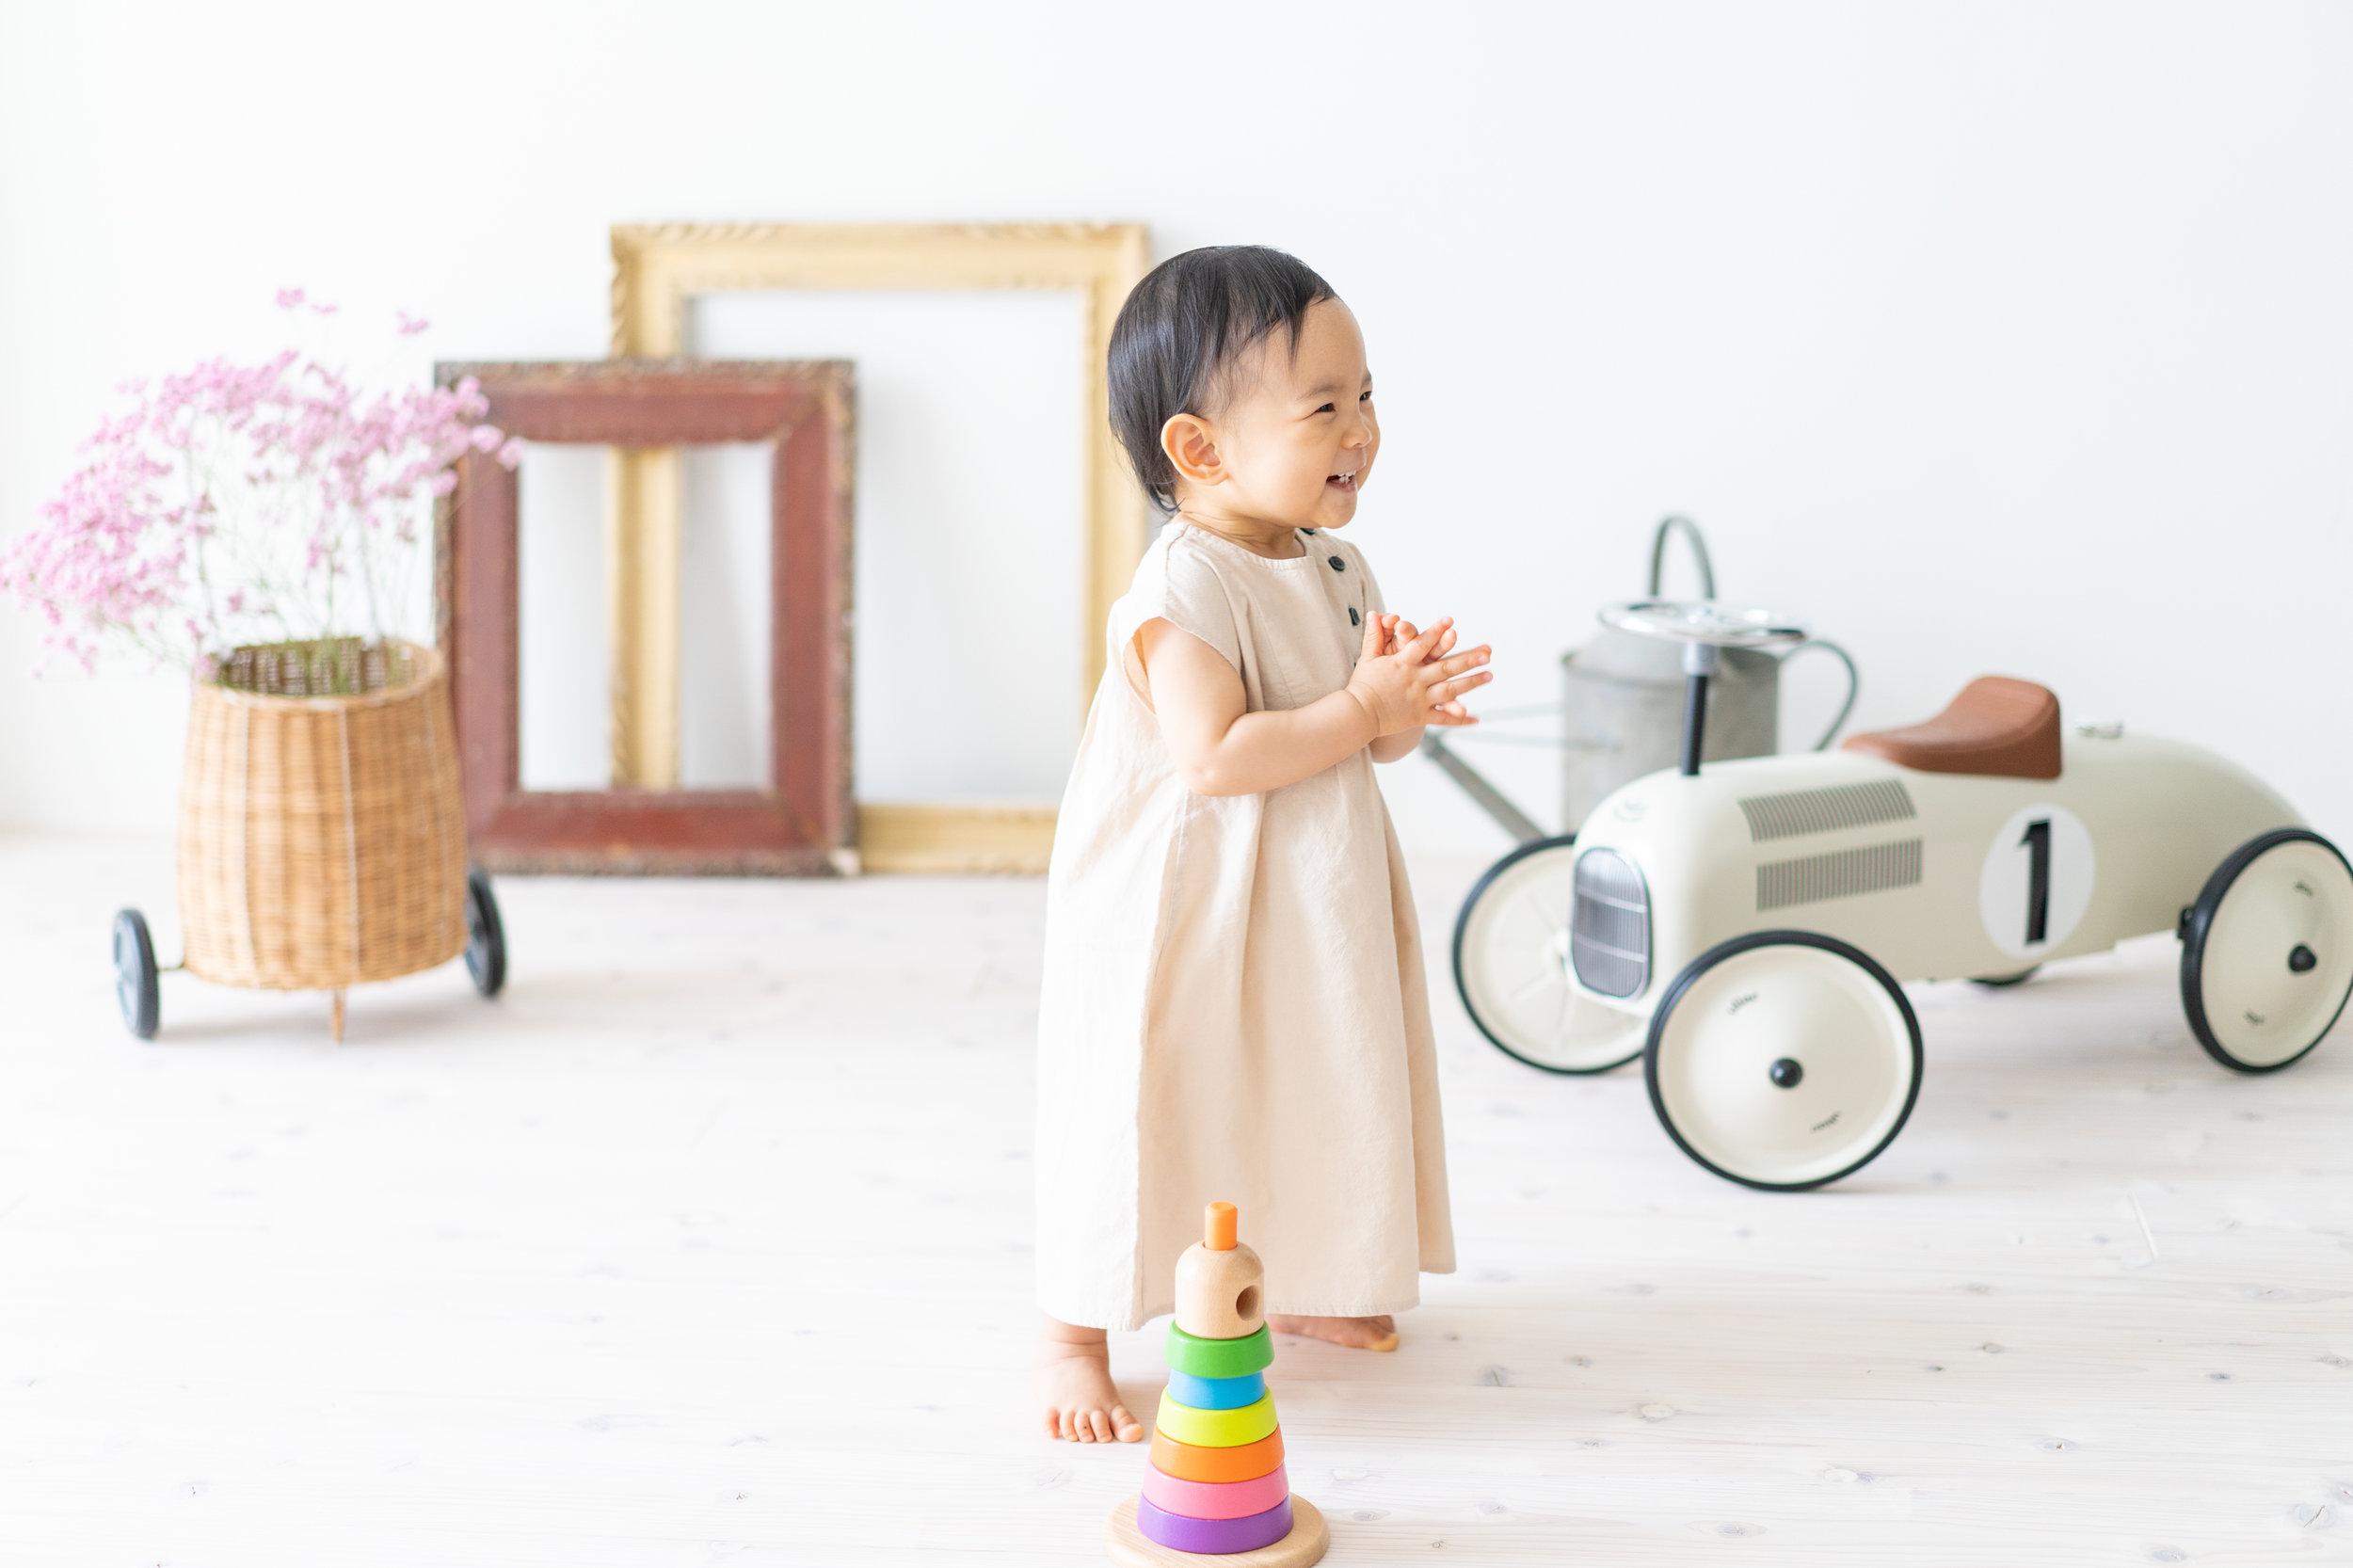 Natural Light Studio - 福岡のシンプルでナチュラルな子供スタジオ / 写真館